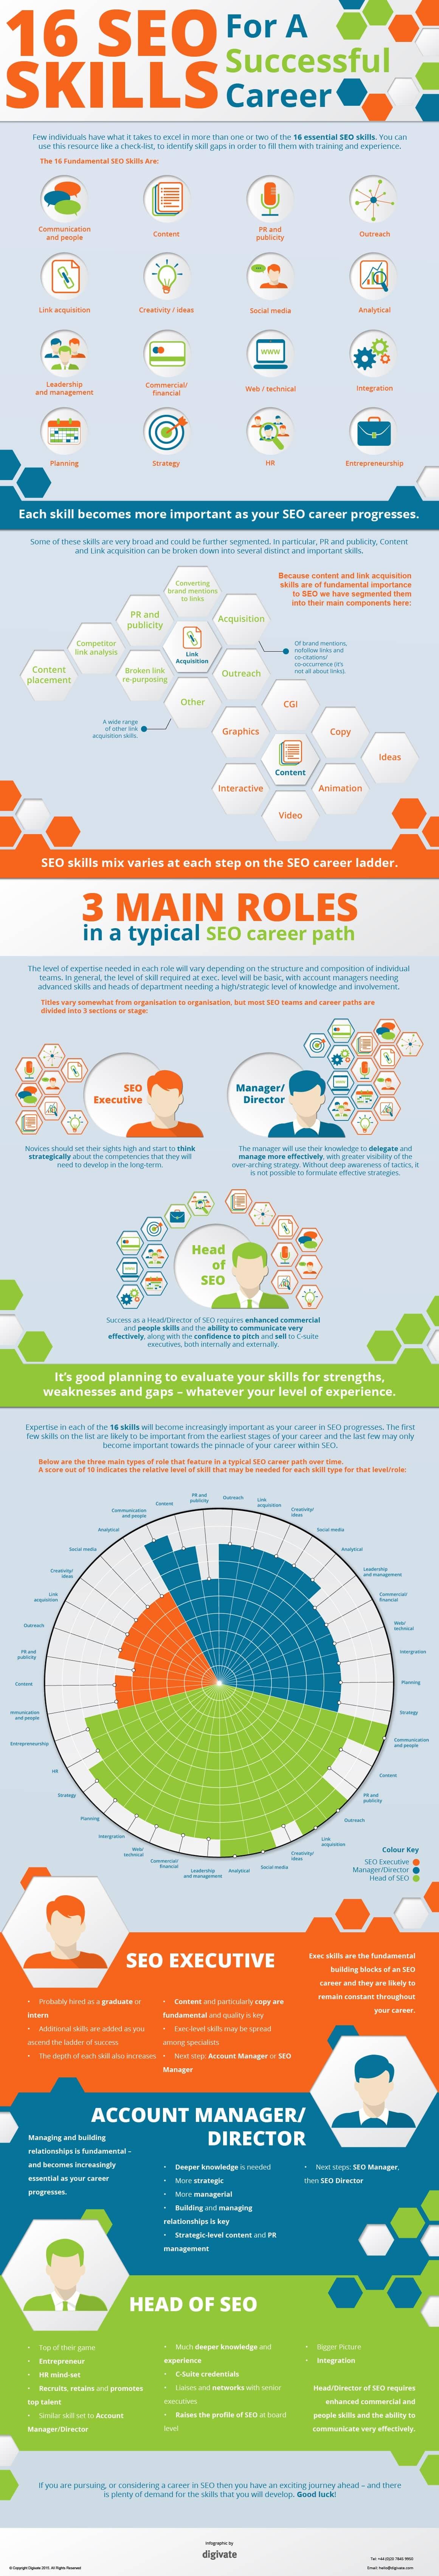 16 SEO Skills Infographic